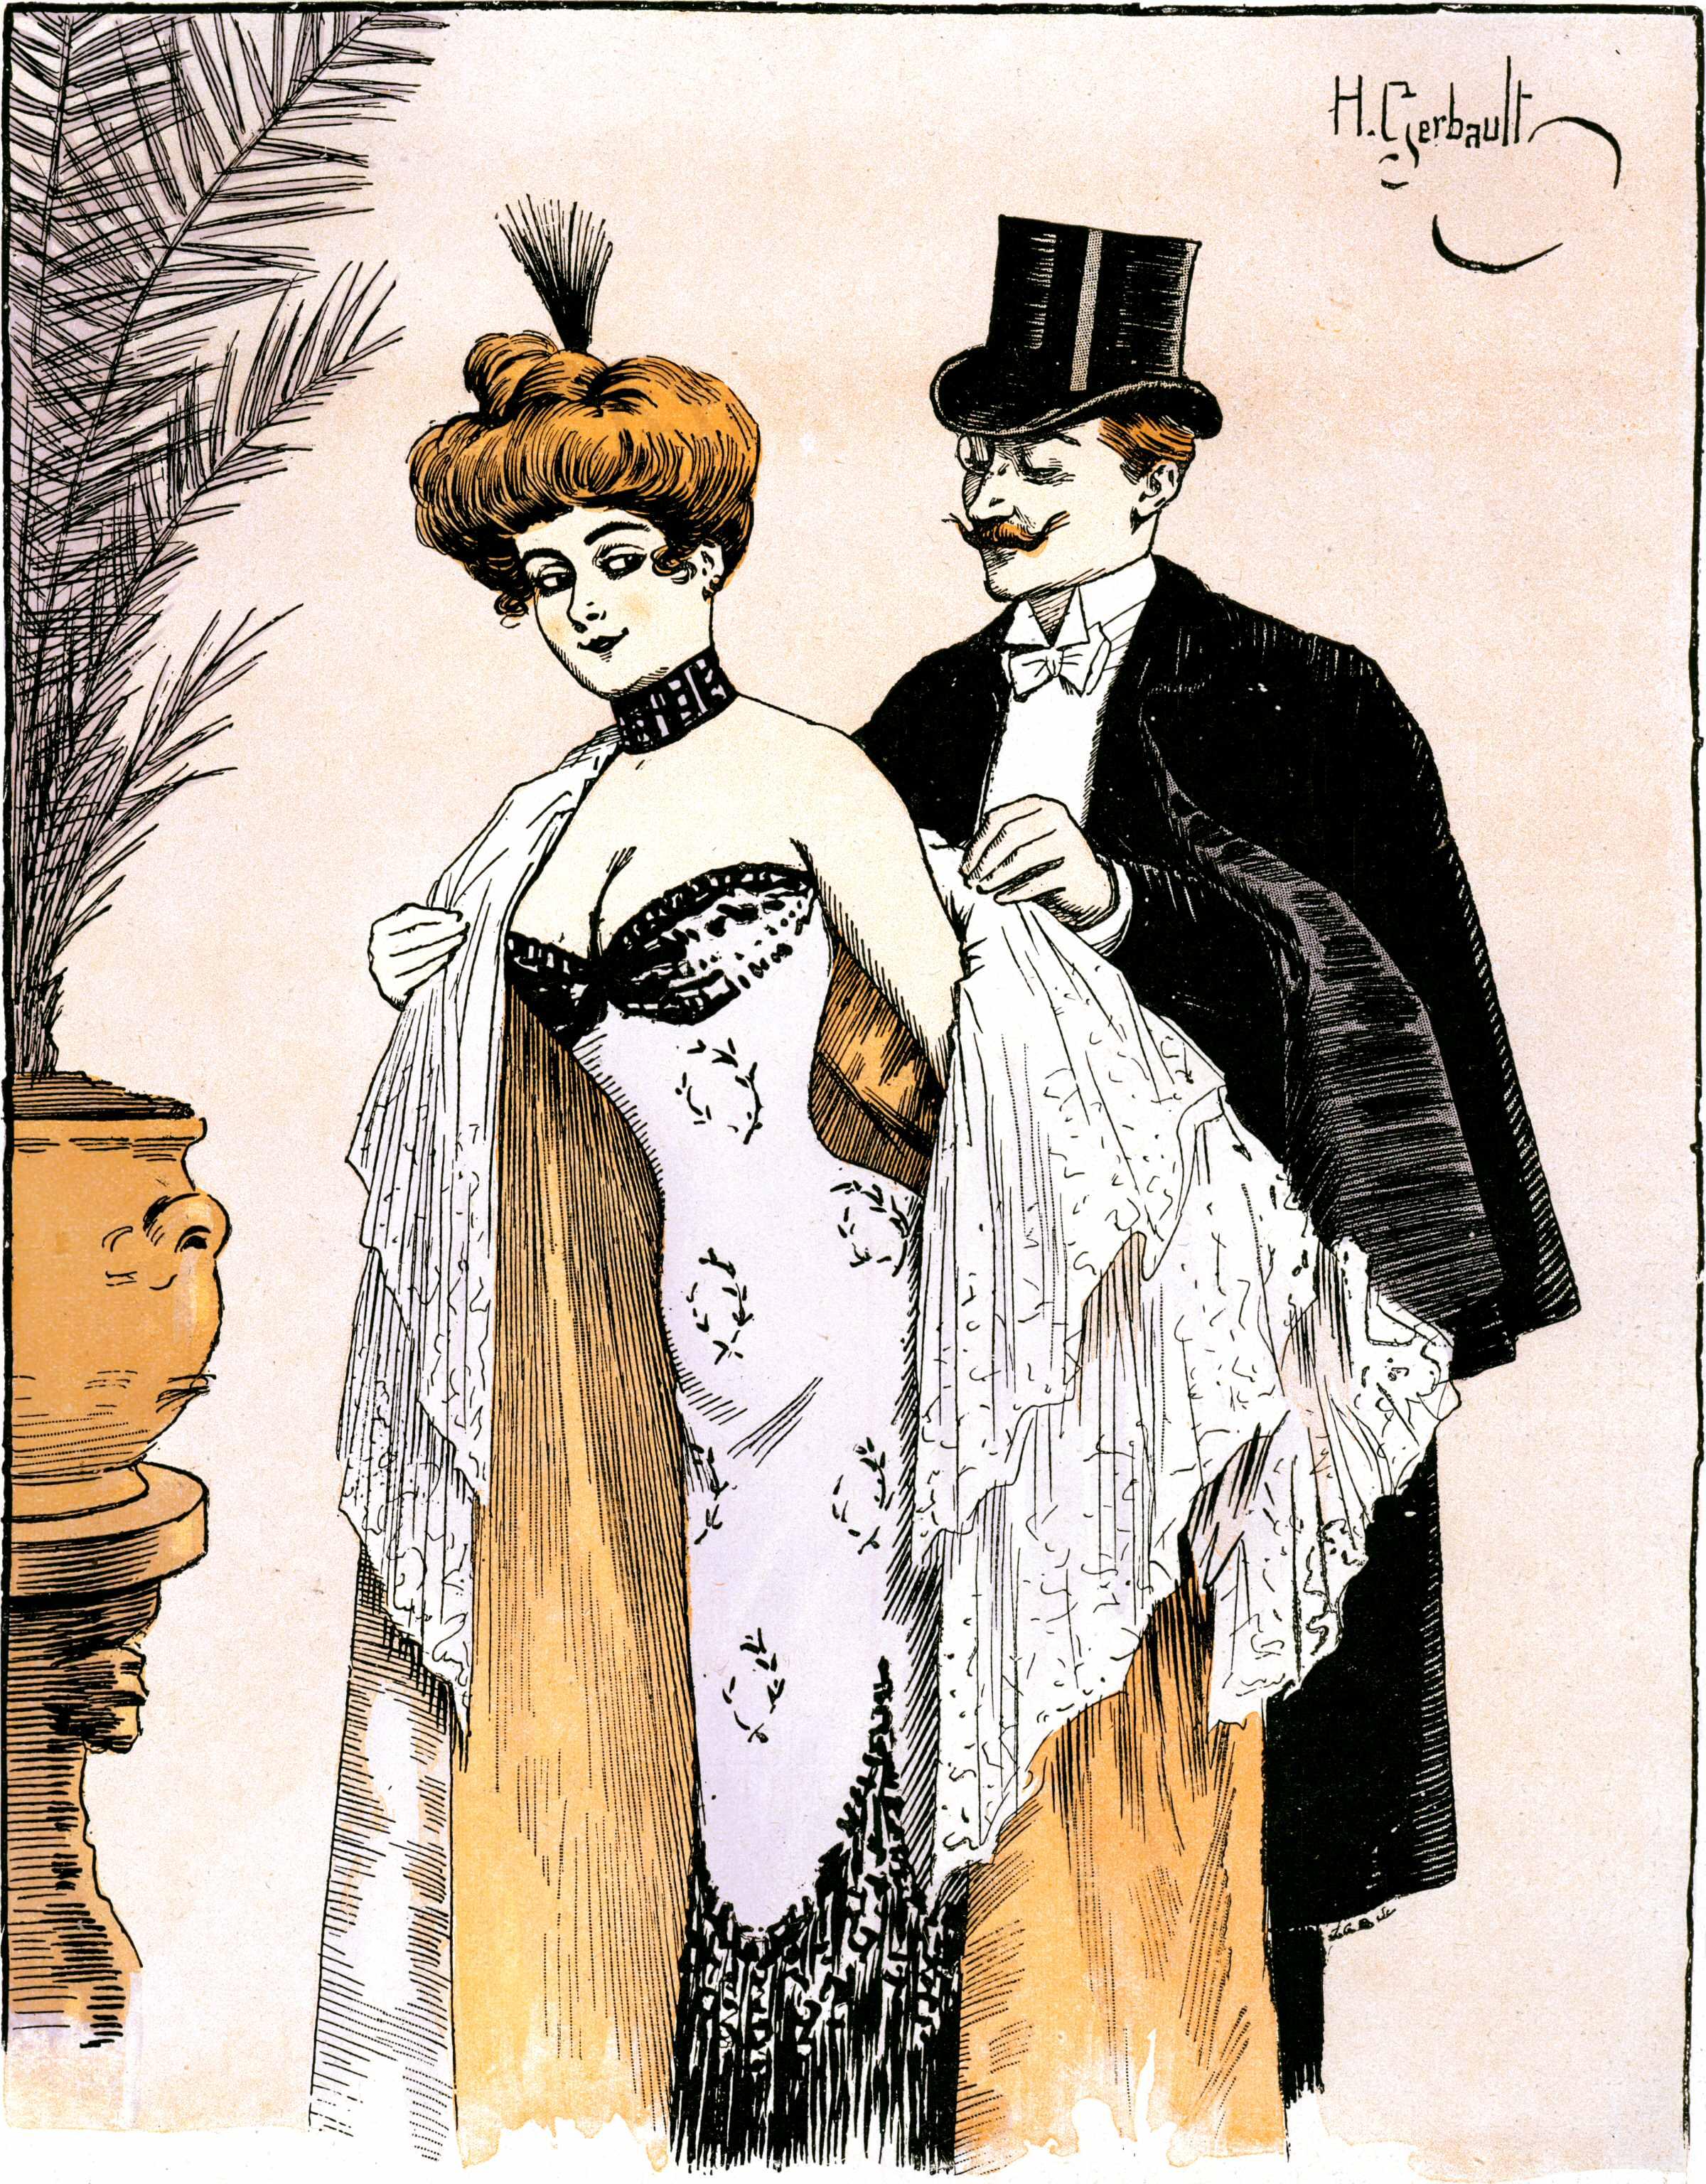 flirter signification r ve rencontre femme libourne